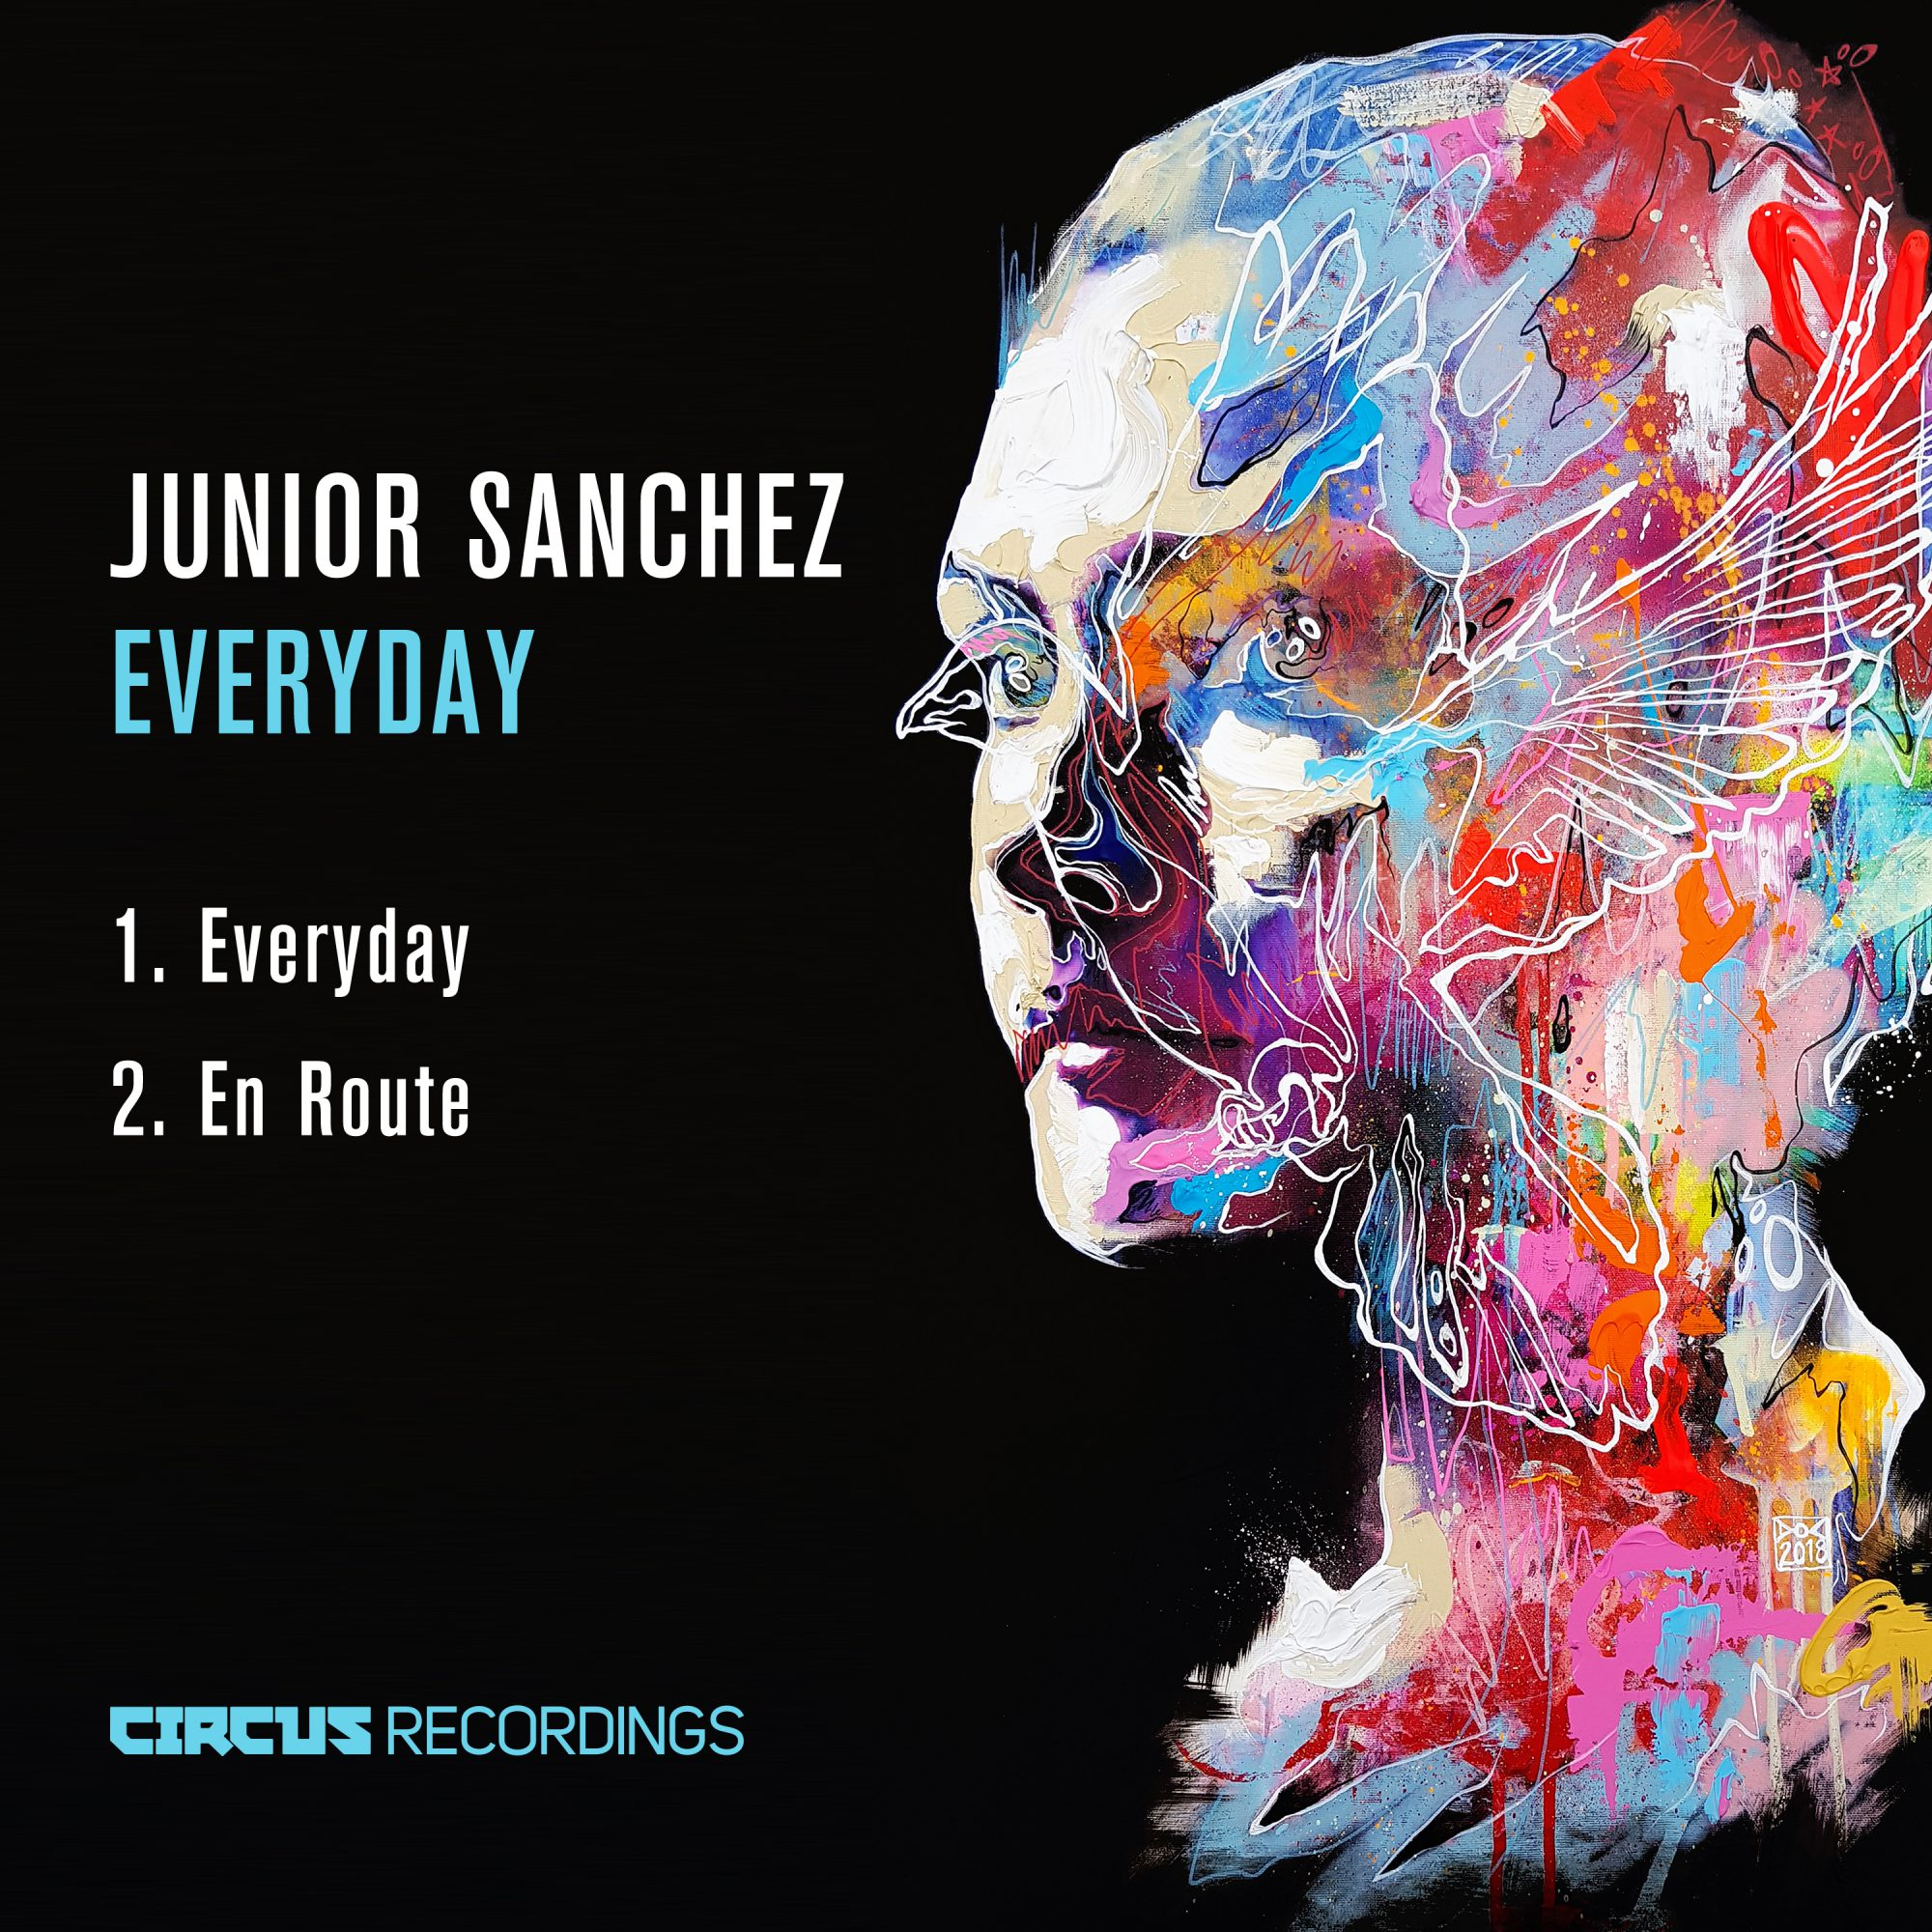 Junior Sanchez Everyday